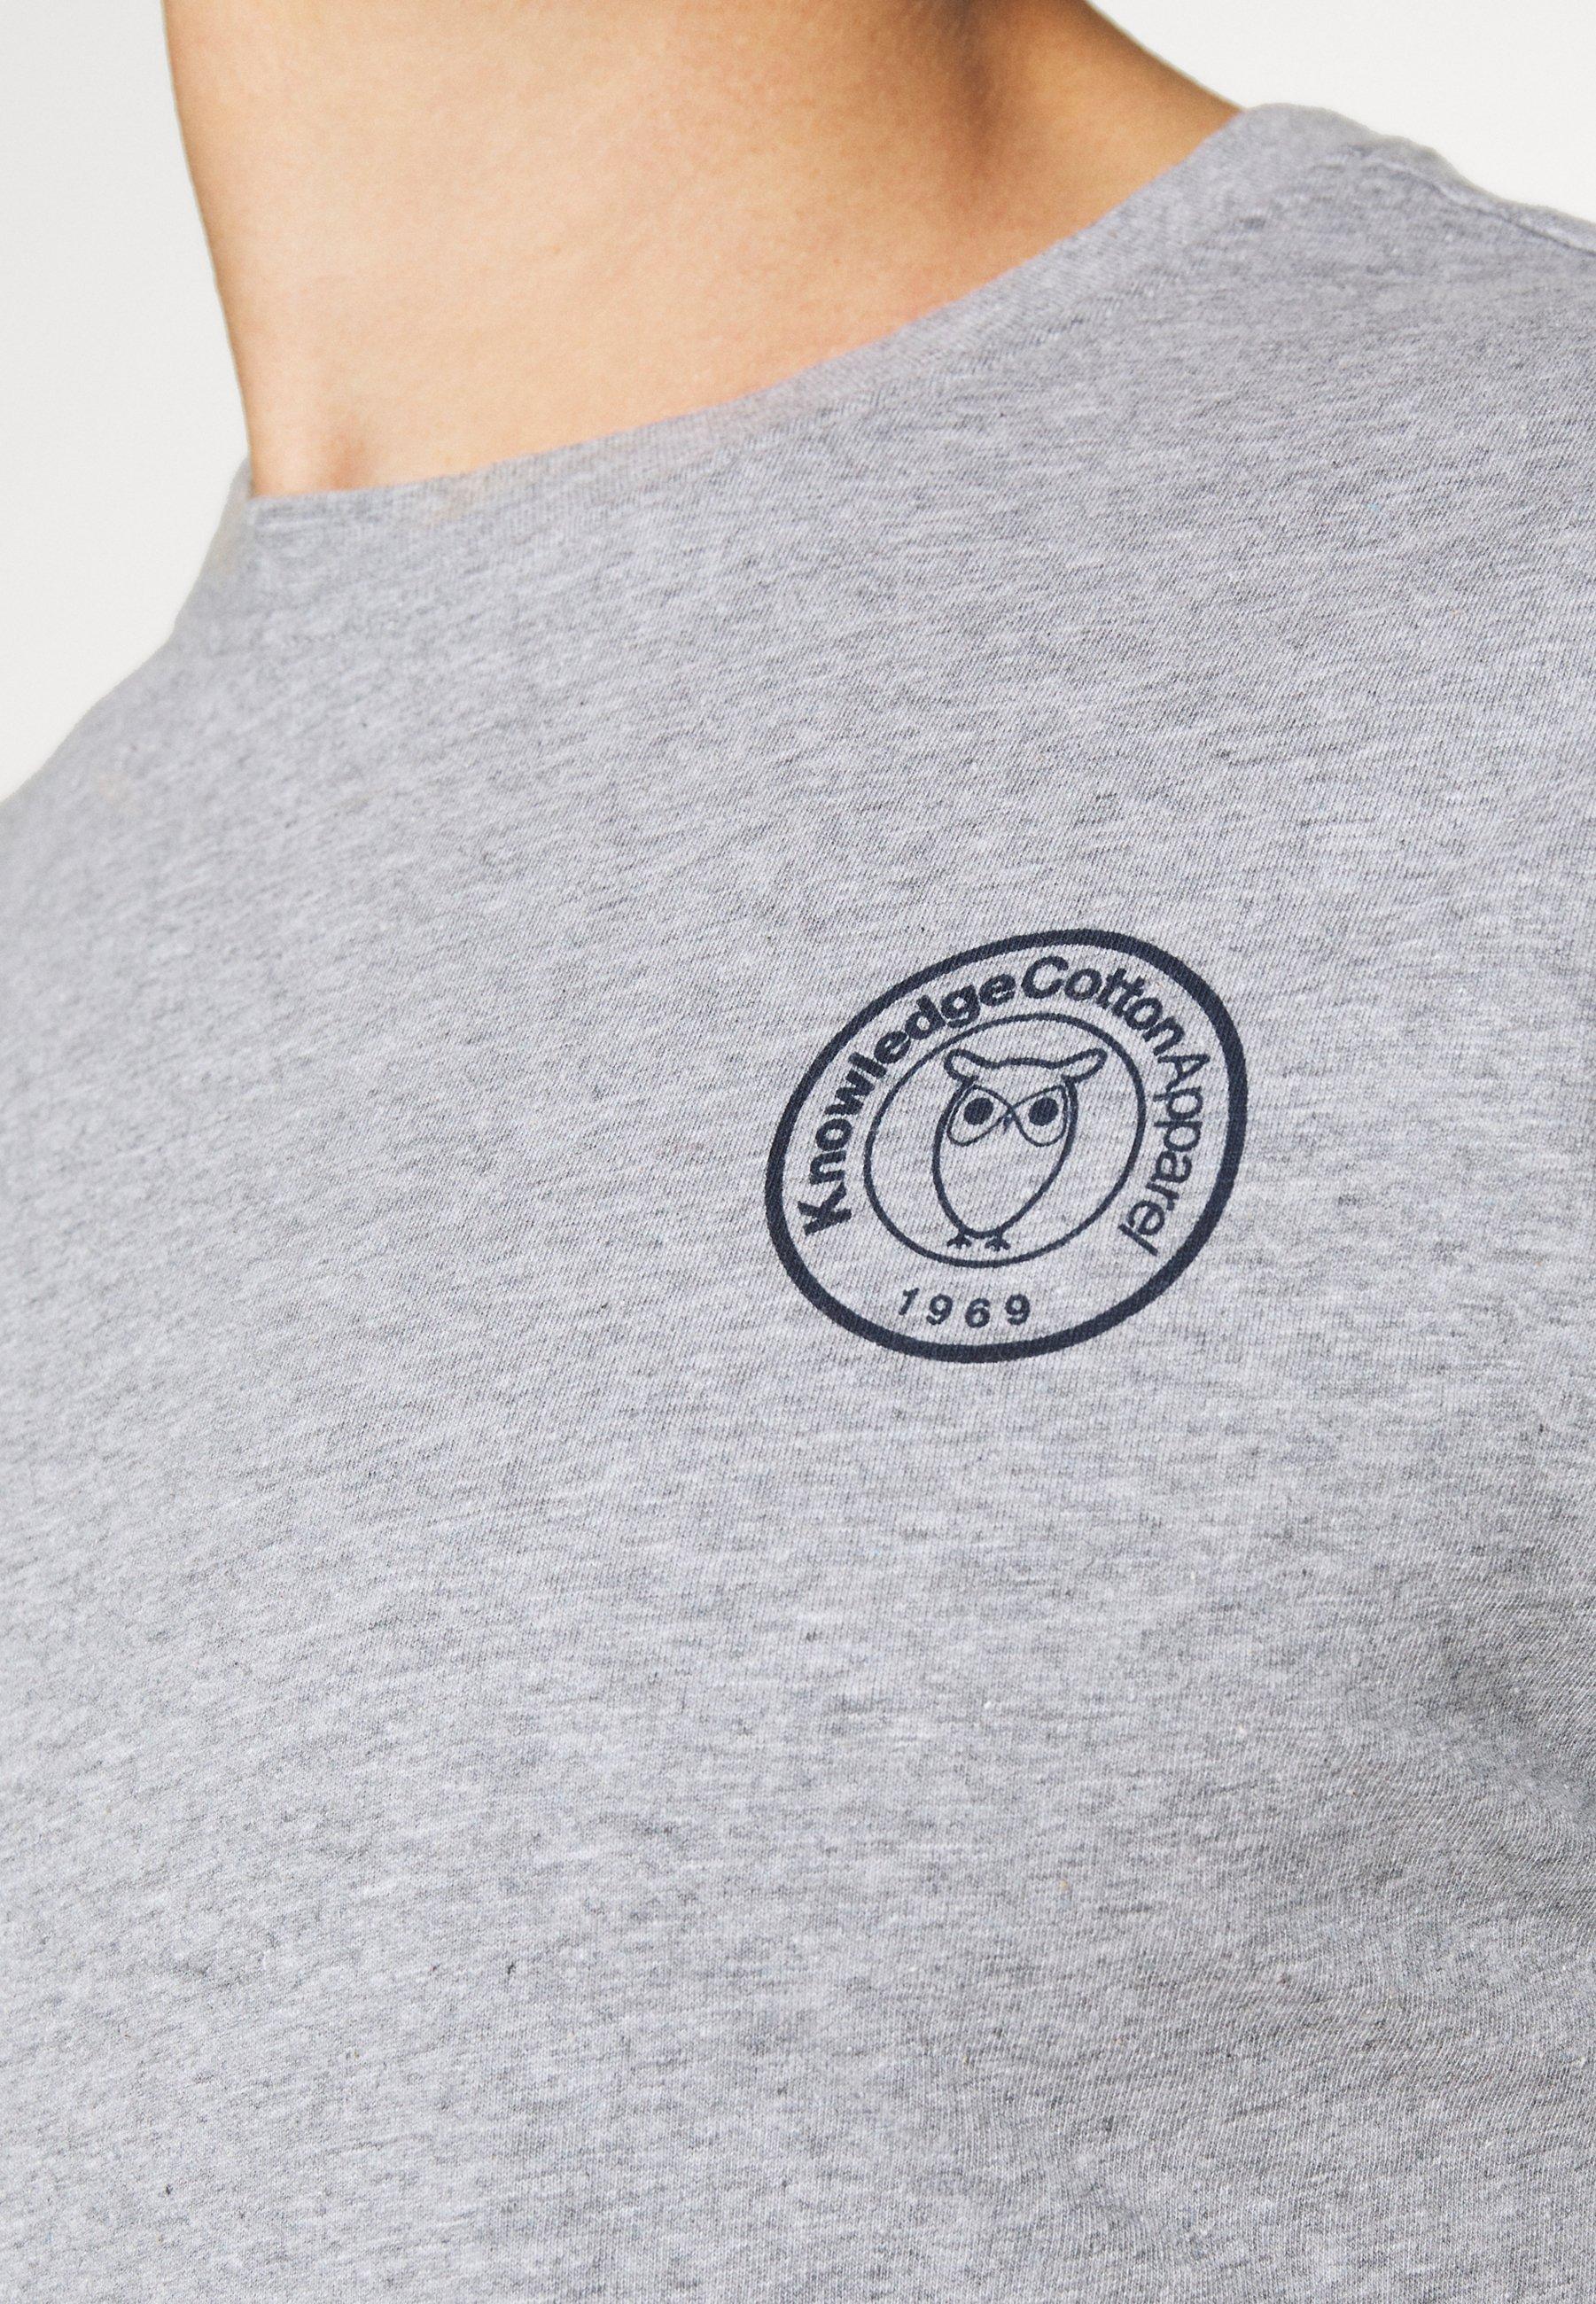 Knowledge Cotton Apparel Alder Owl Badge Tee - T-shirt Print Mottled Grey